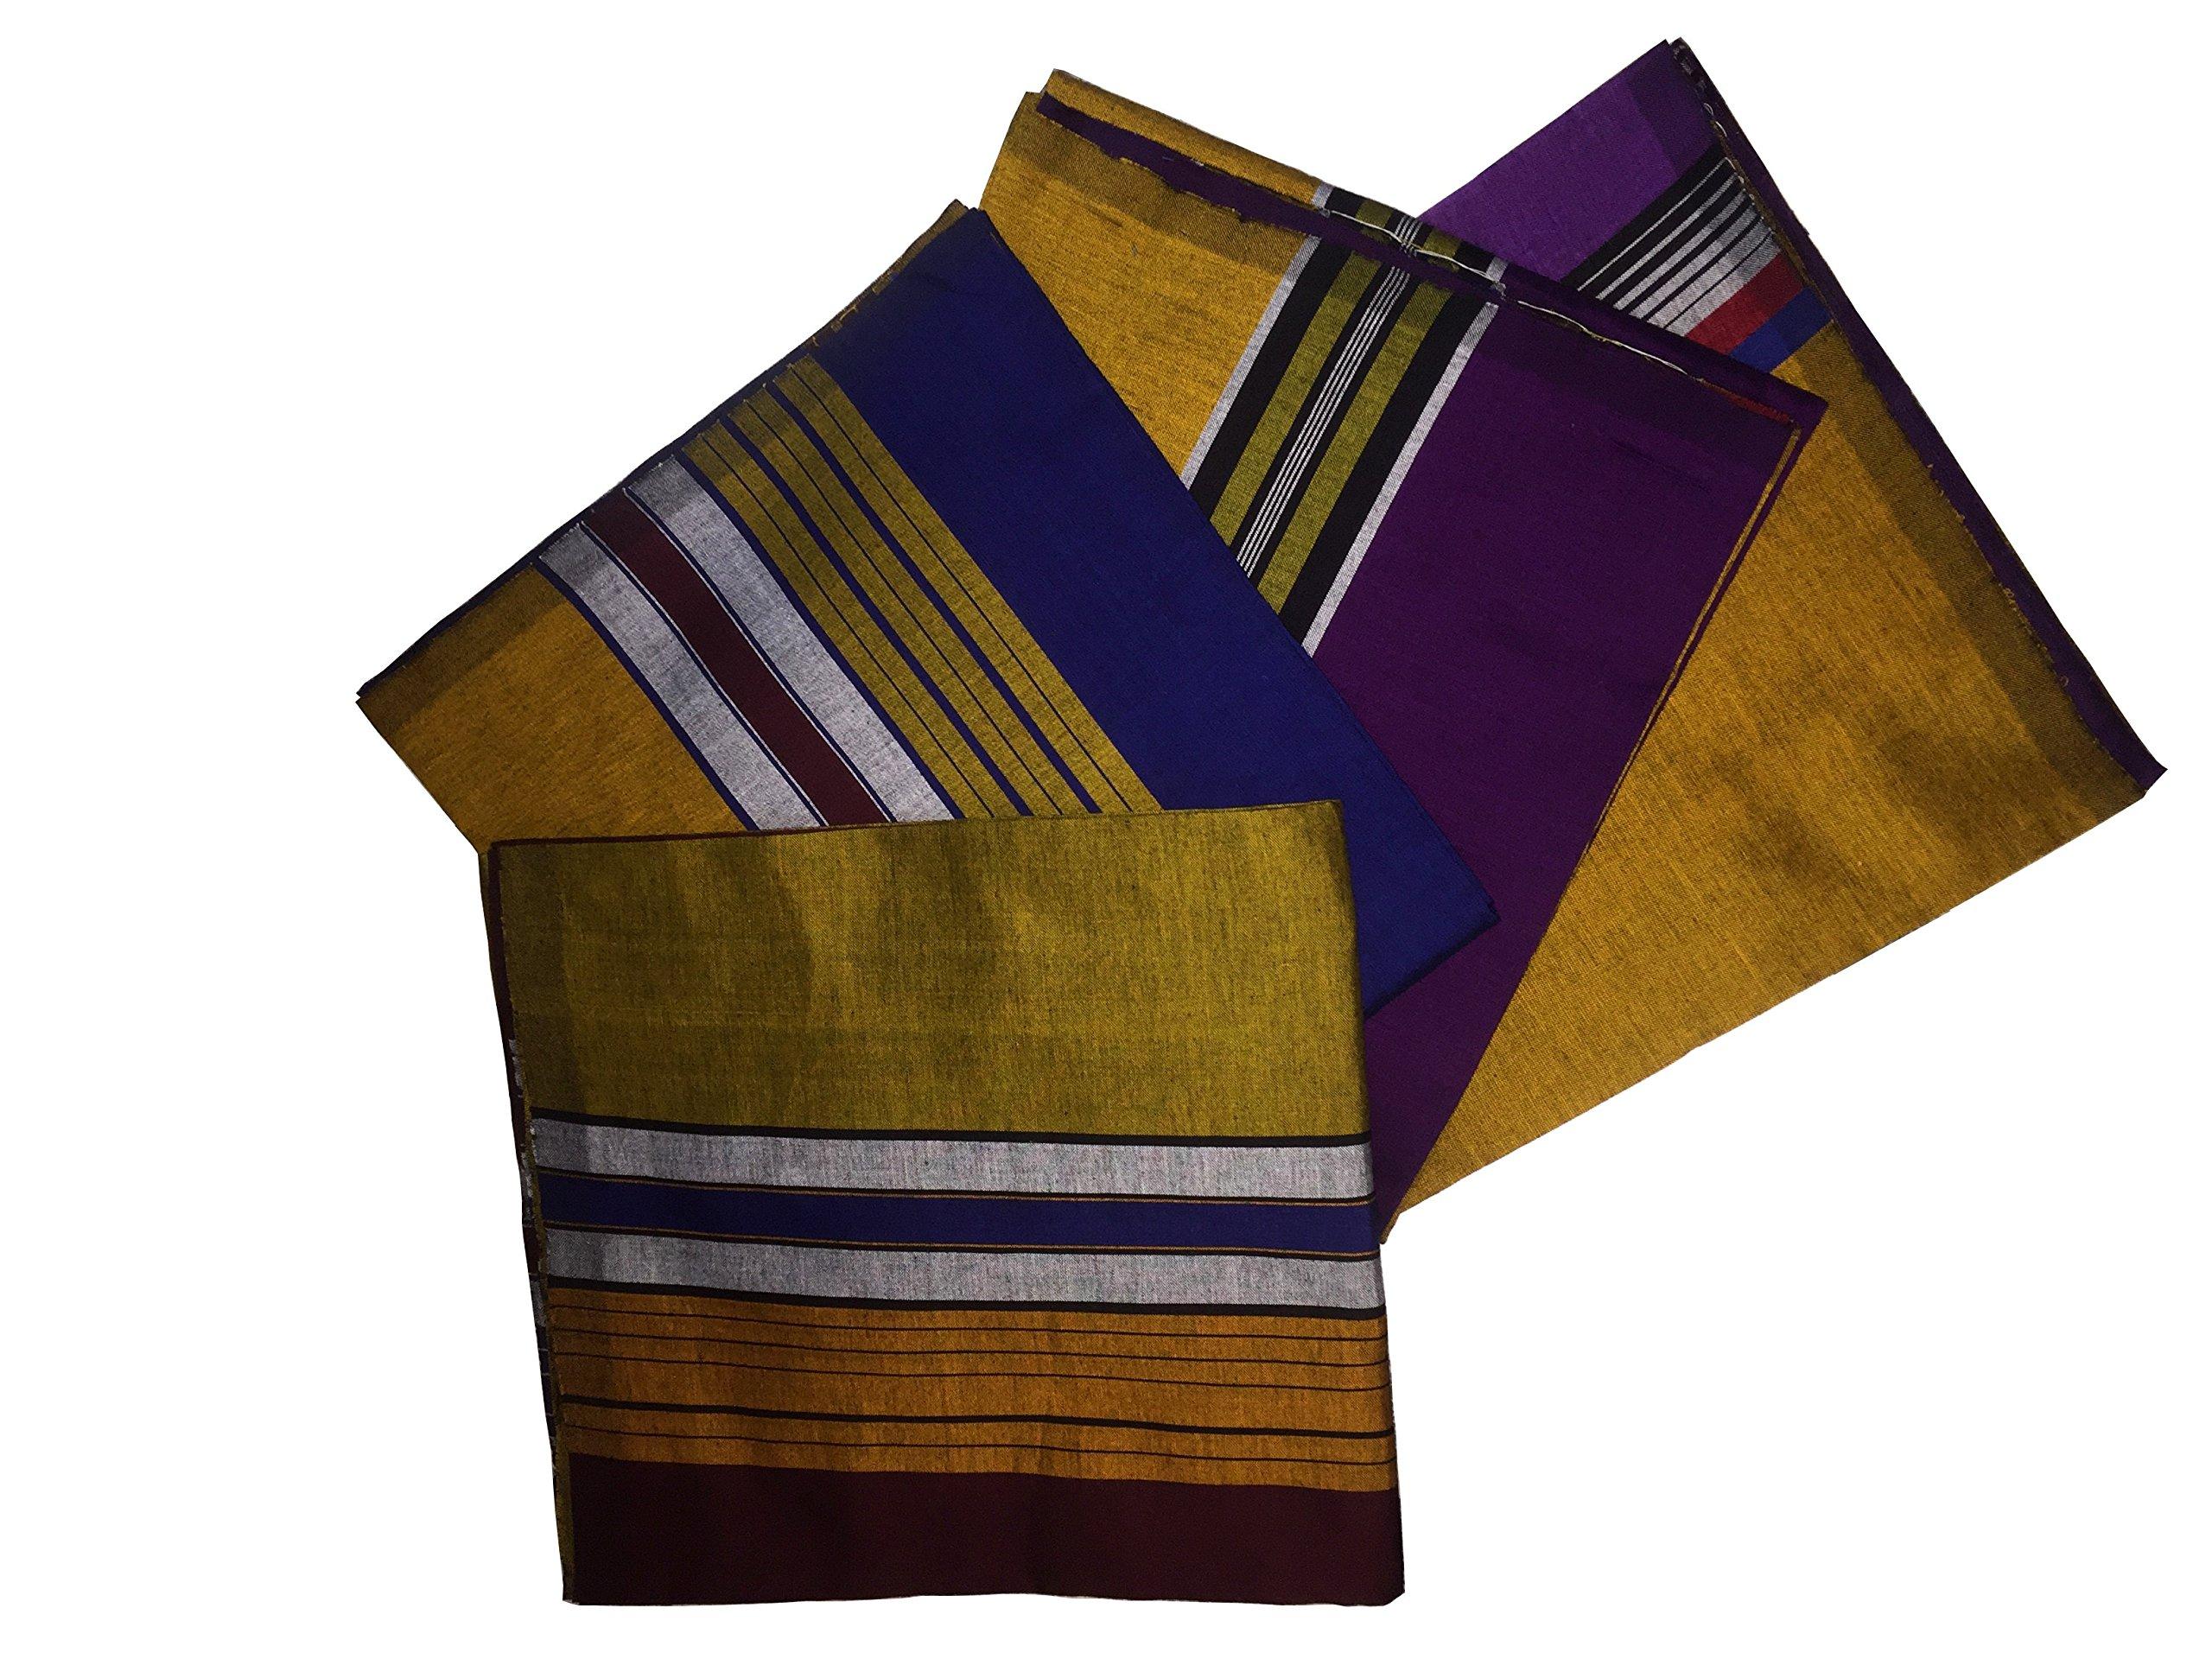 ReenaHANDS Lungi Sarong Mens Handloom Lungi Sarong 100% Cotton. Stitched Tube Sarong. Assorted Color/Design by ReenaHANDS (Image #3)